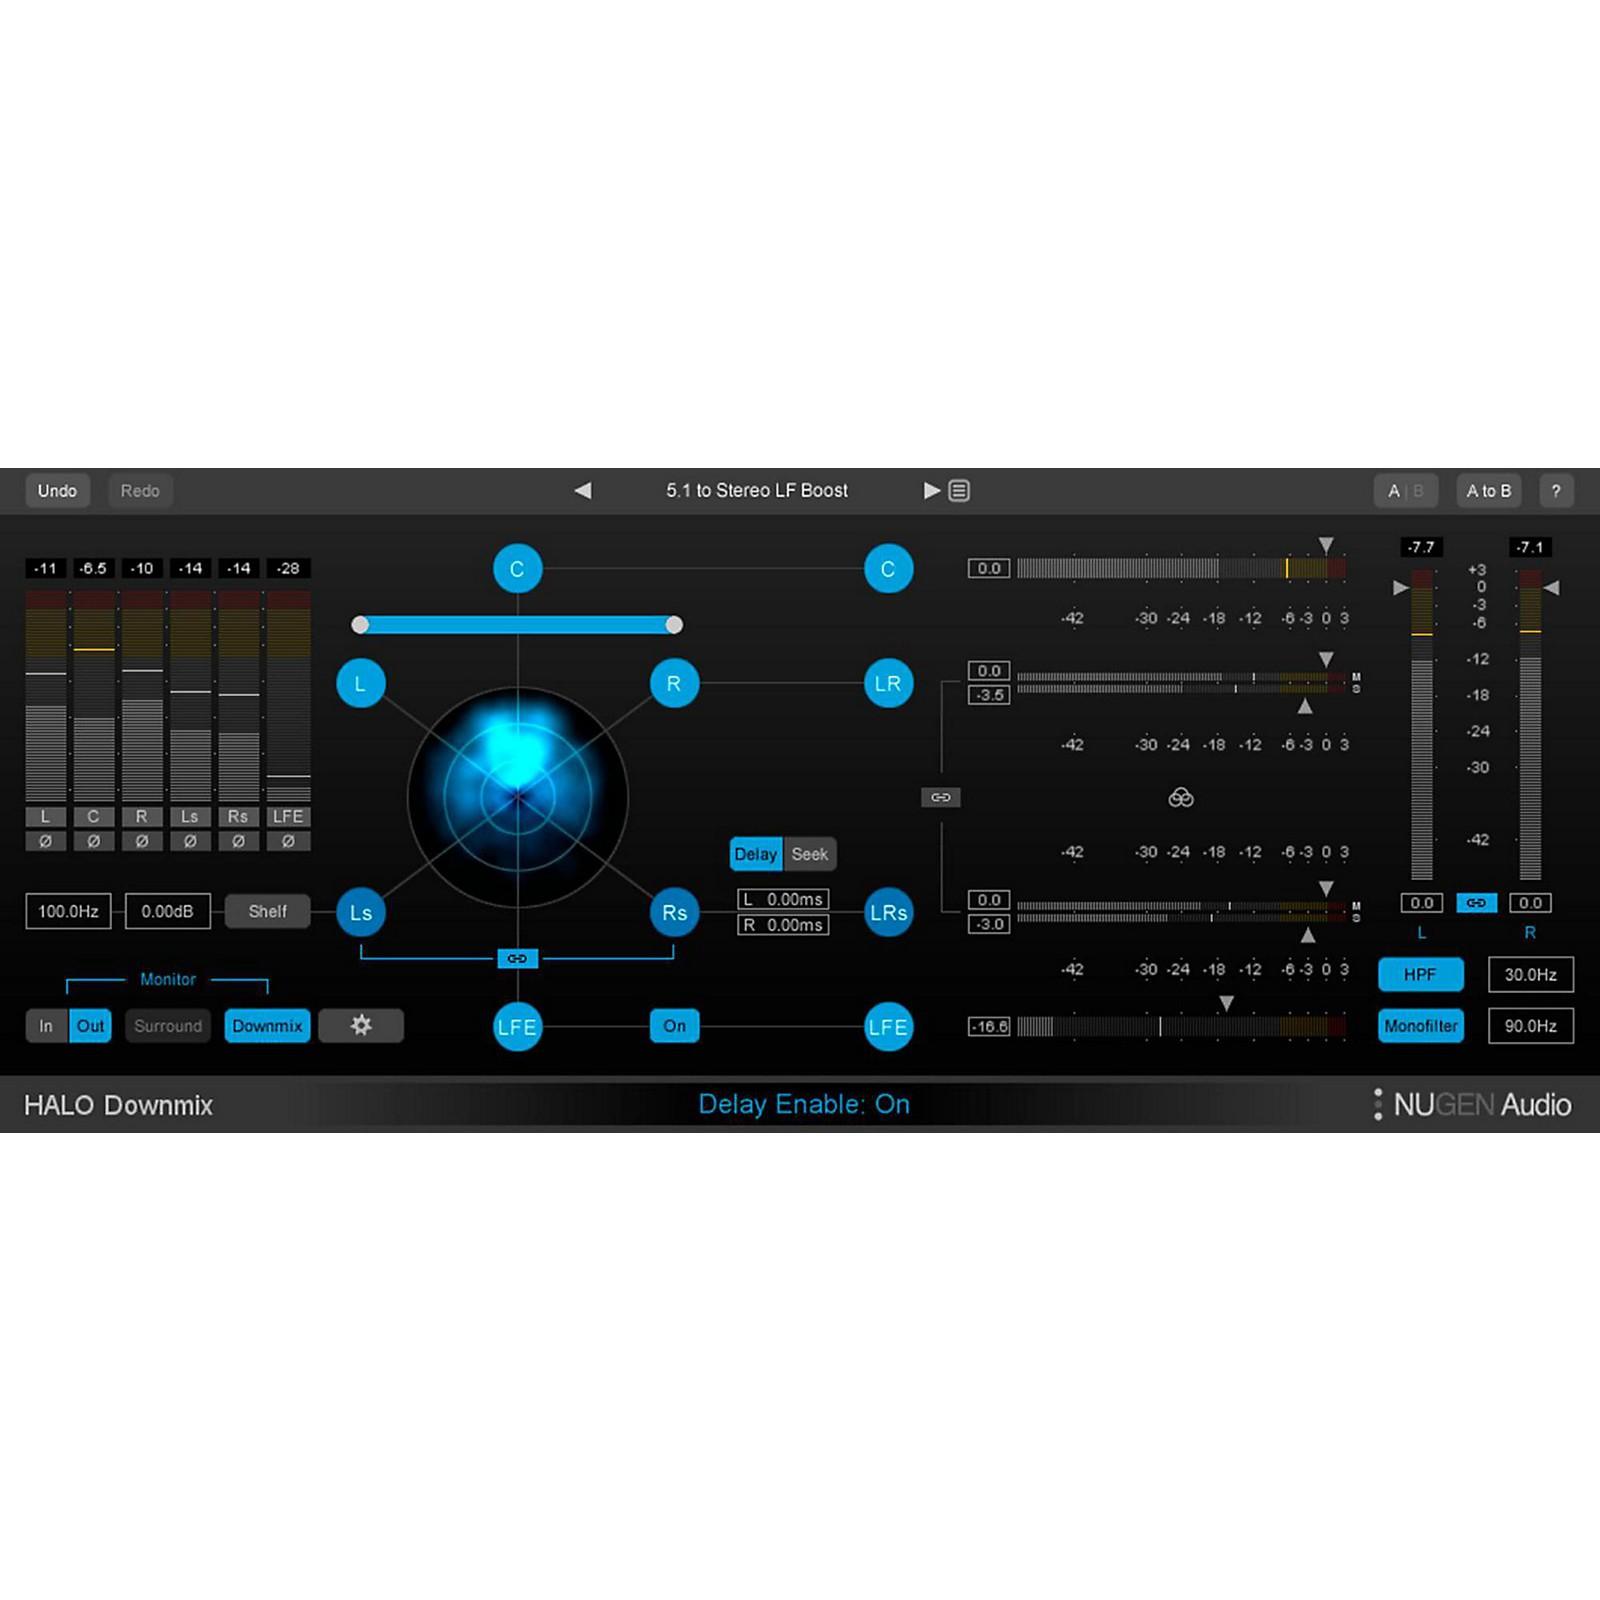 NuGen Audio Halo Downmix